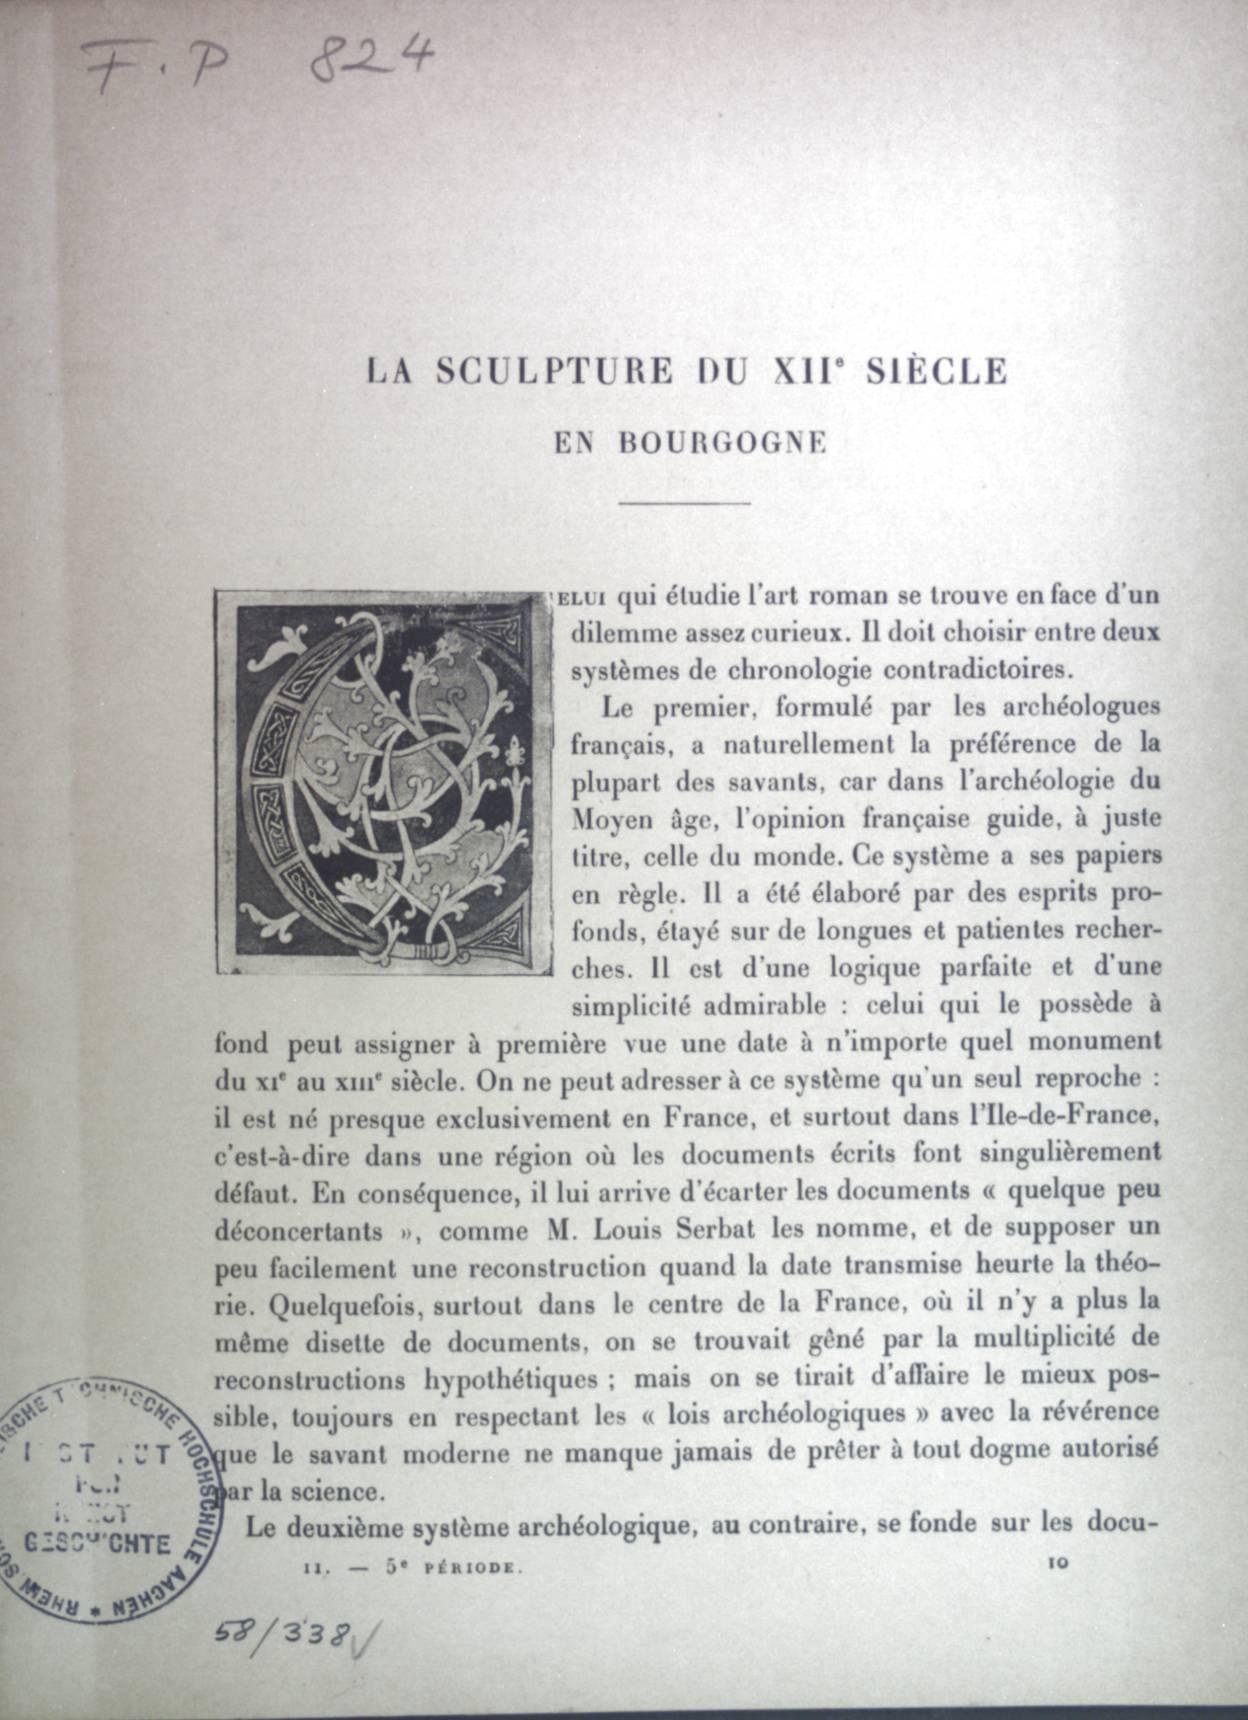 La sculpture du XIIe siecle en Bourgogne.: Porter, A. Kingsley